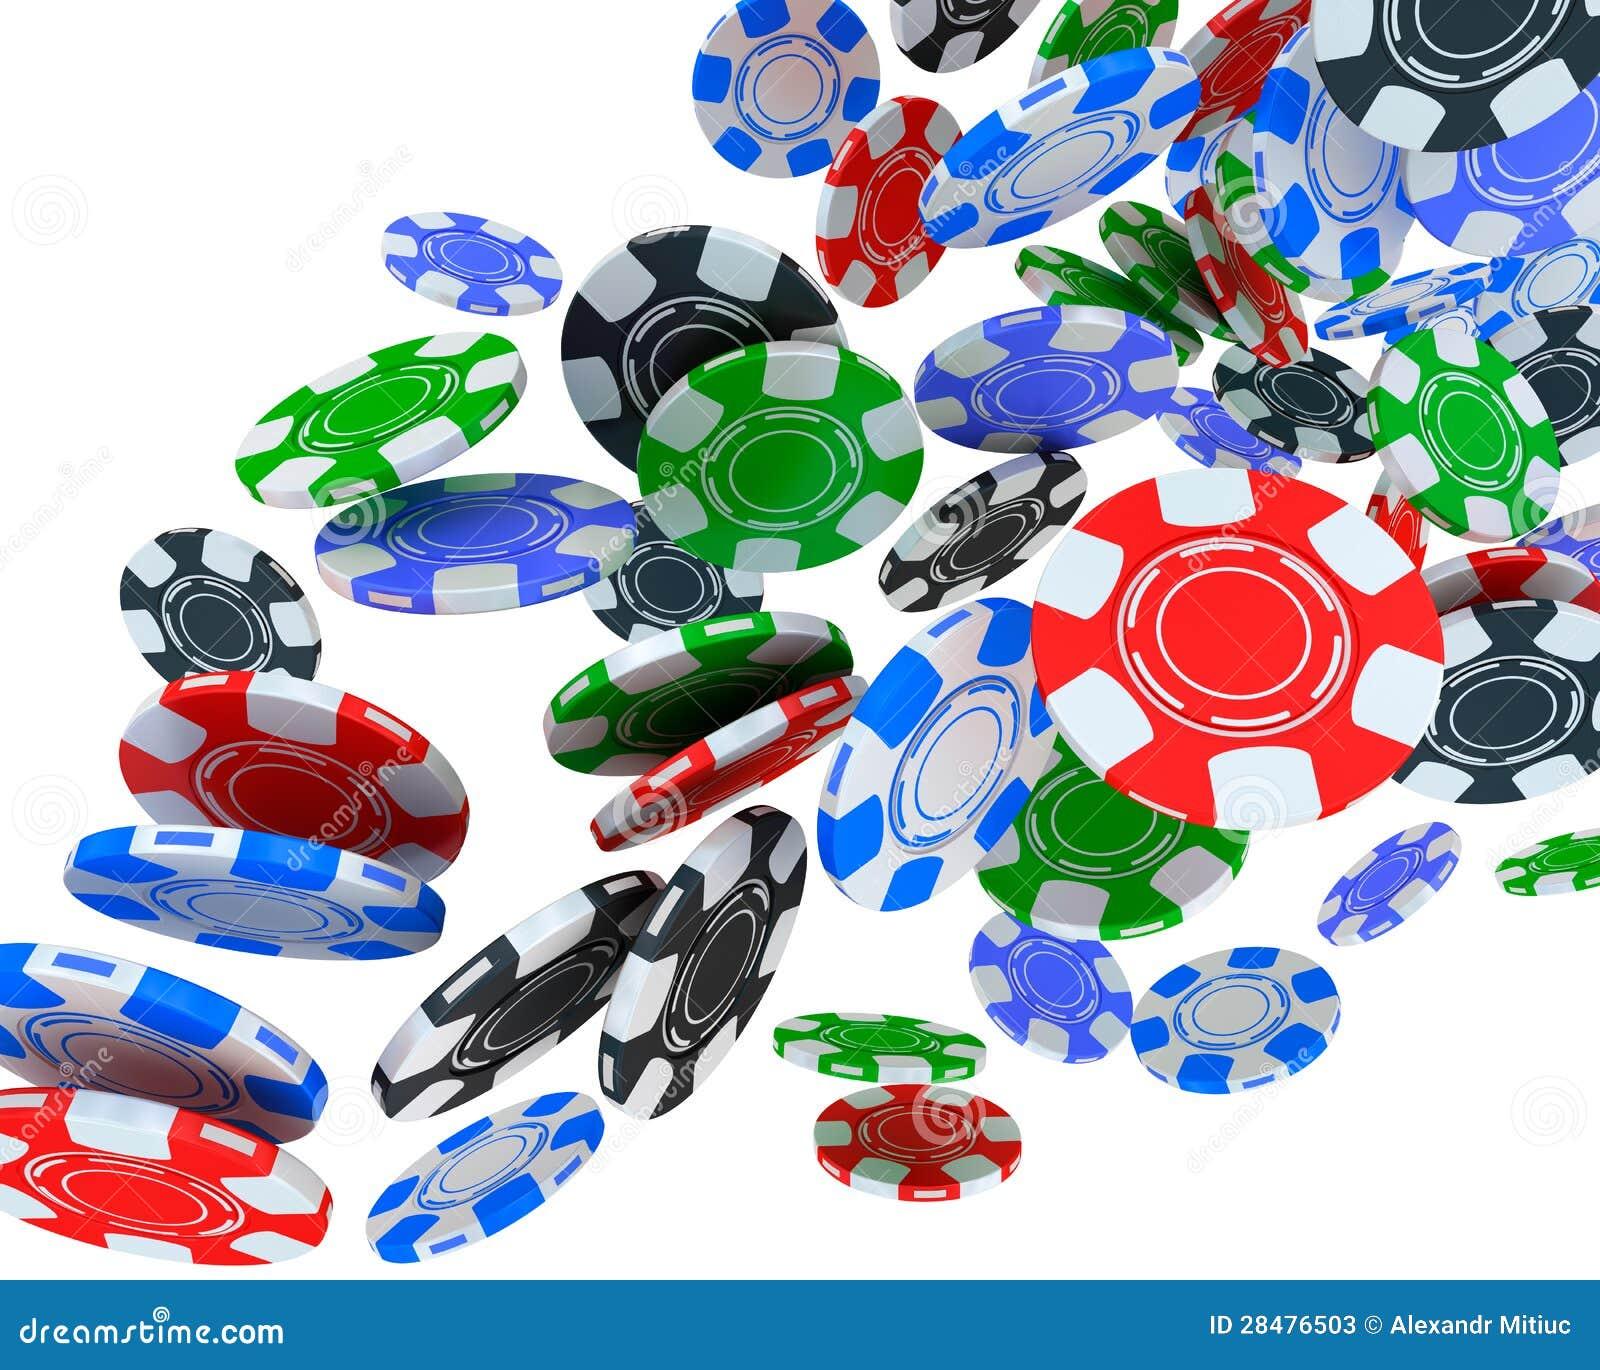 Jetons De Poker Tombant Sur Le Fond Blanc. Illustration